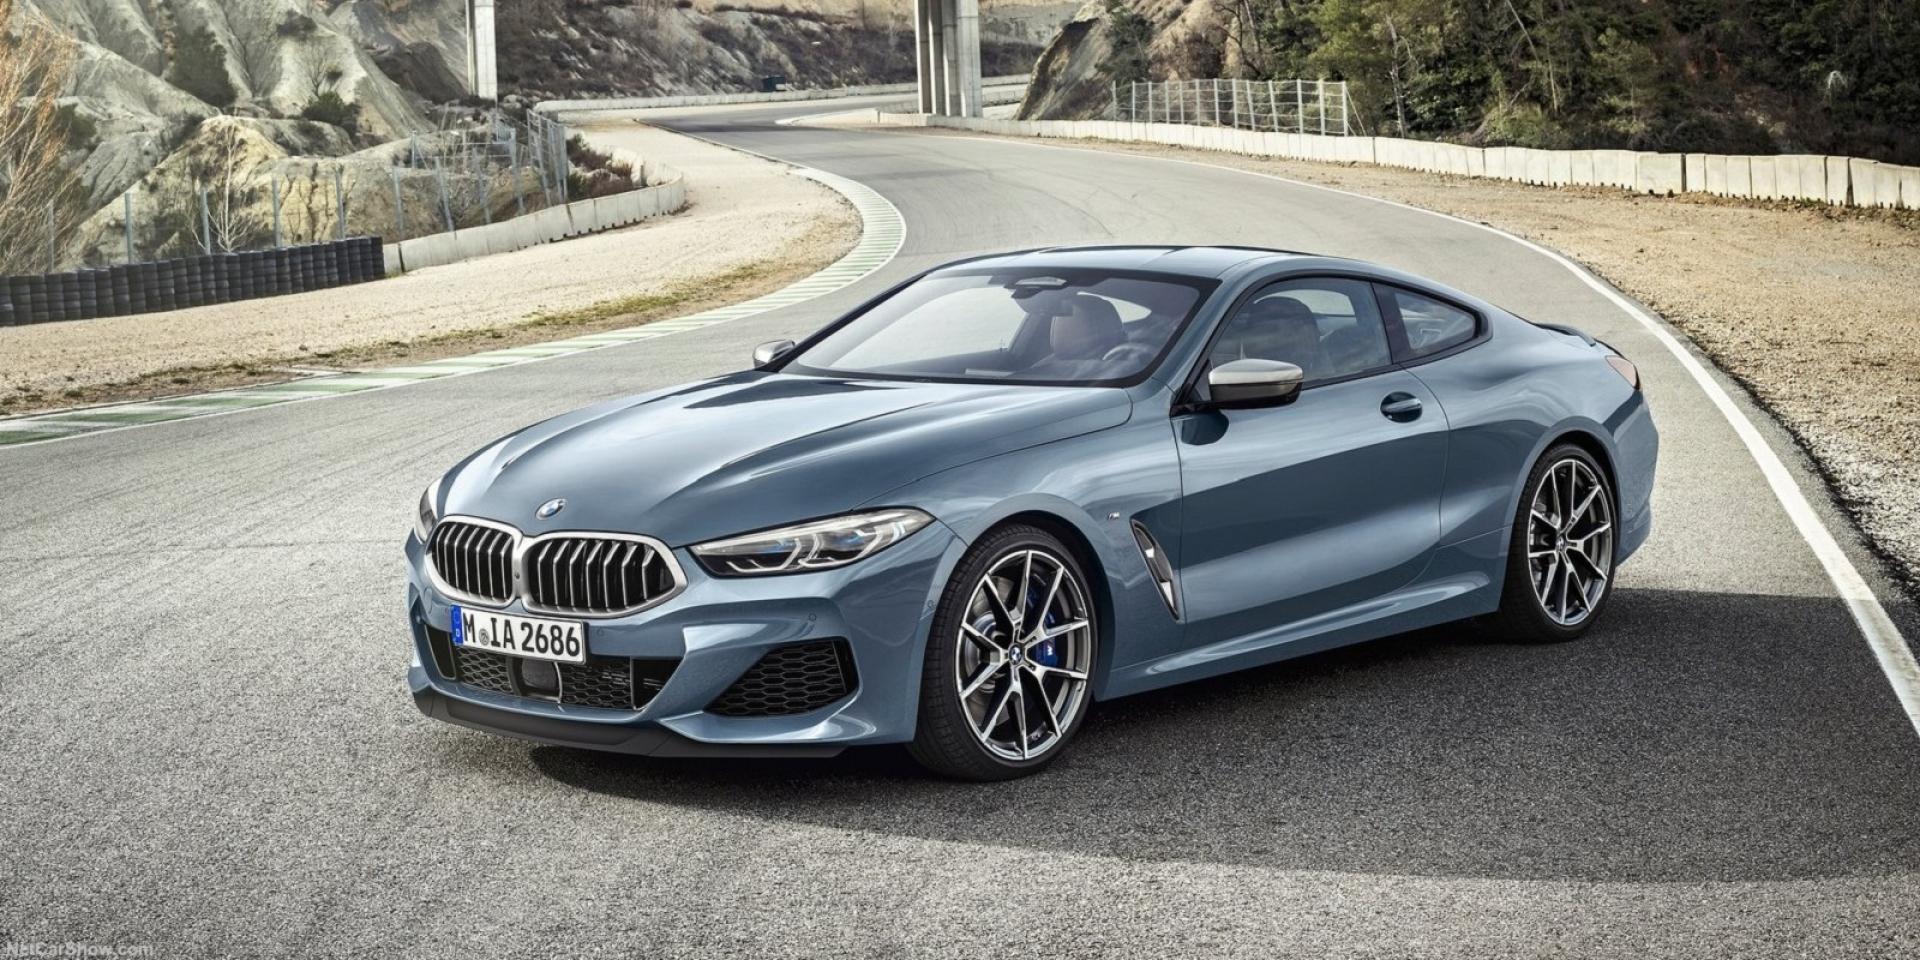 BMW 8系列復出,豪華兼具性能M850i xDrive三秒破百